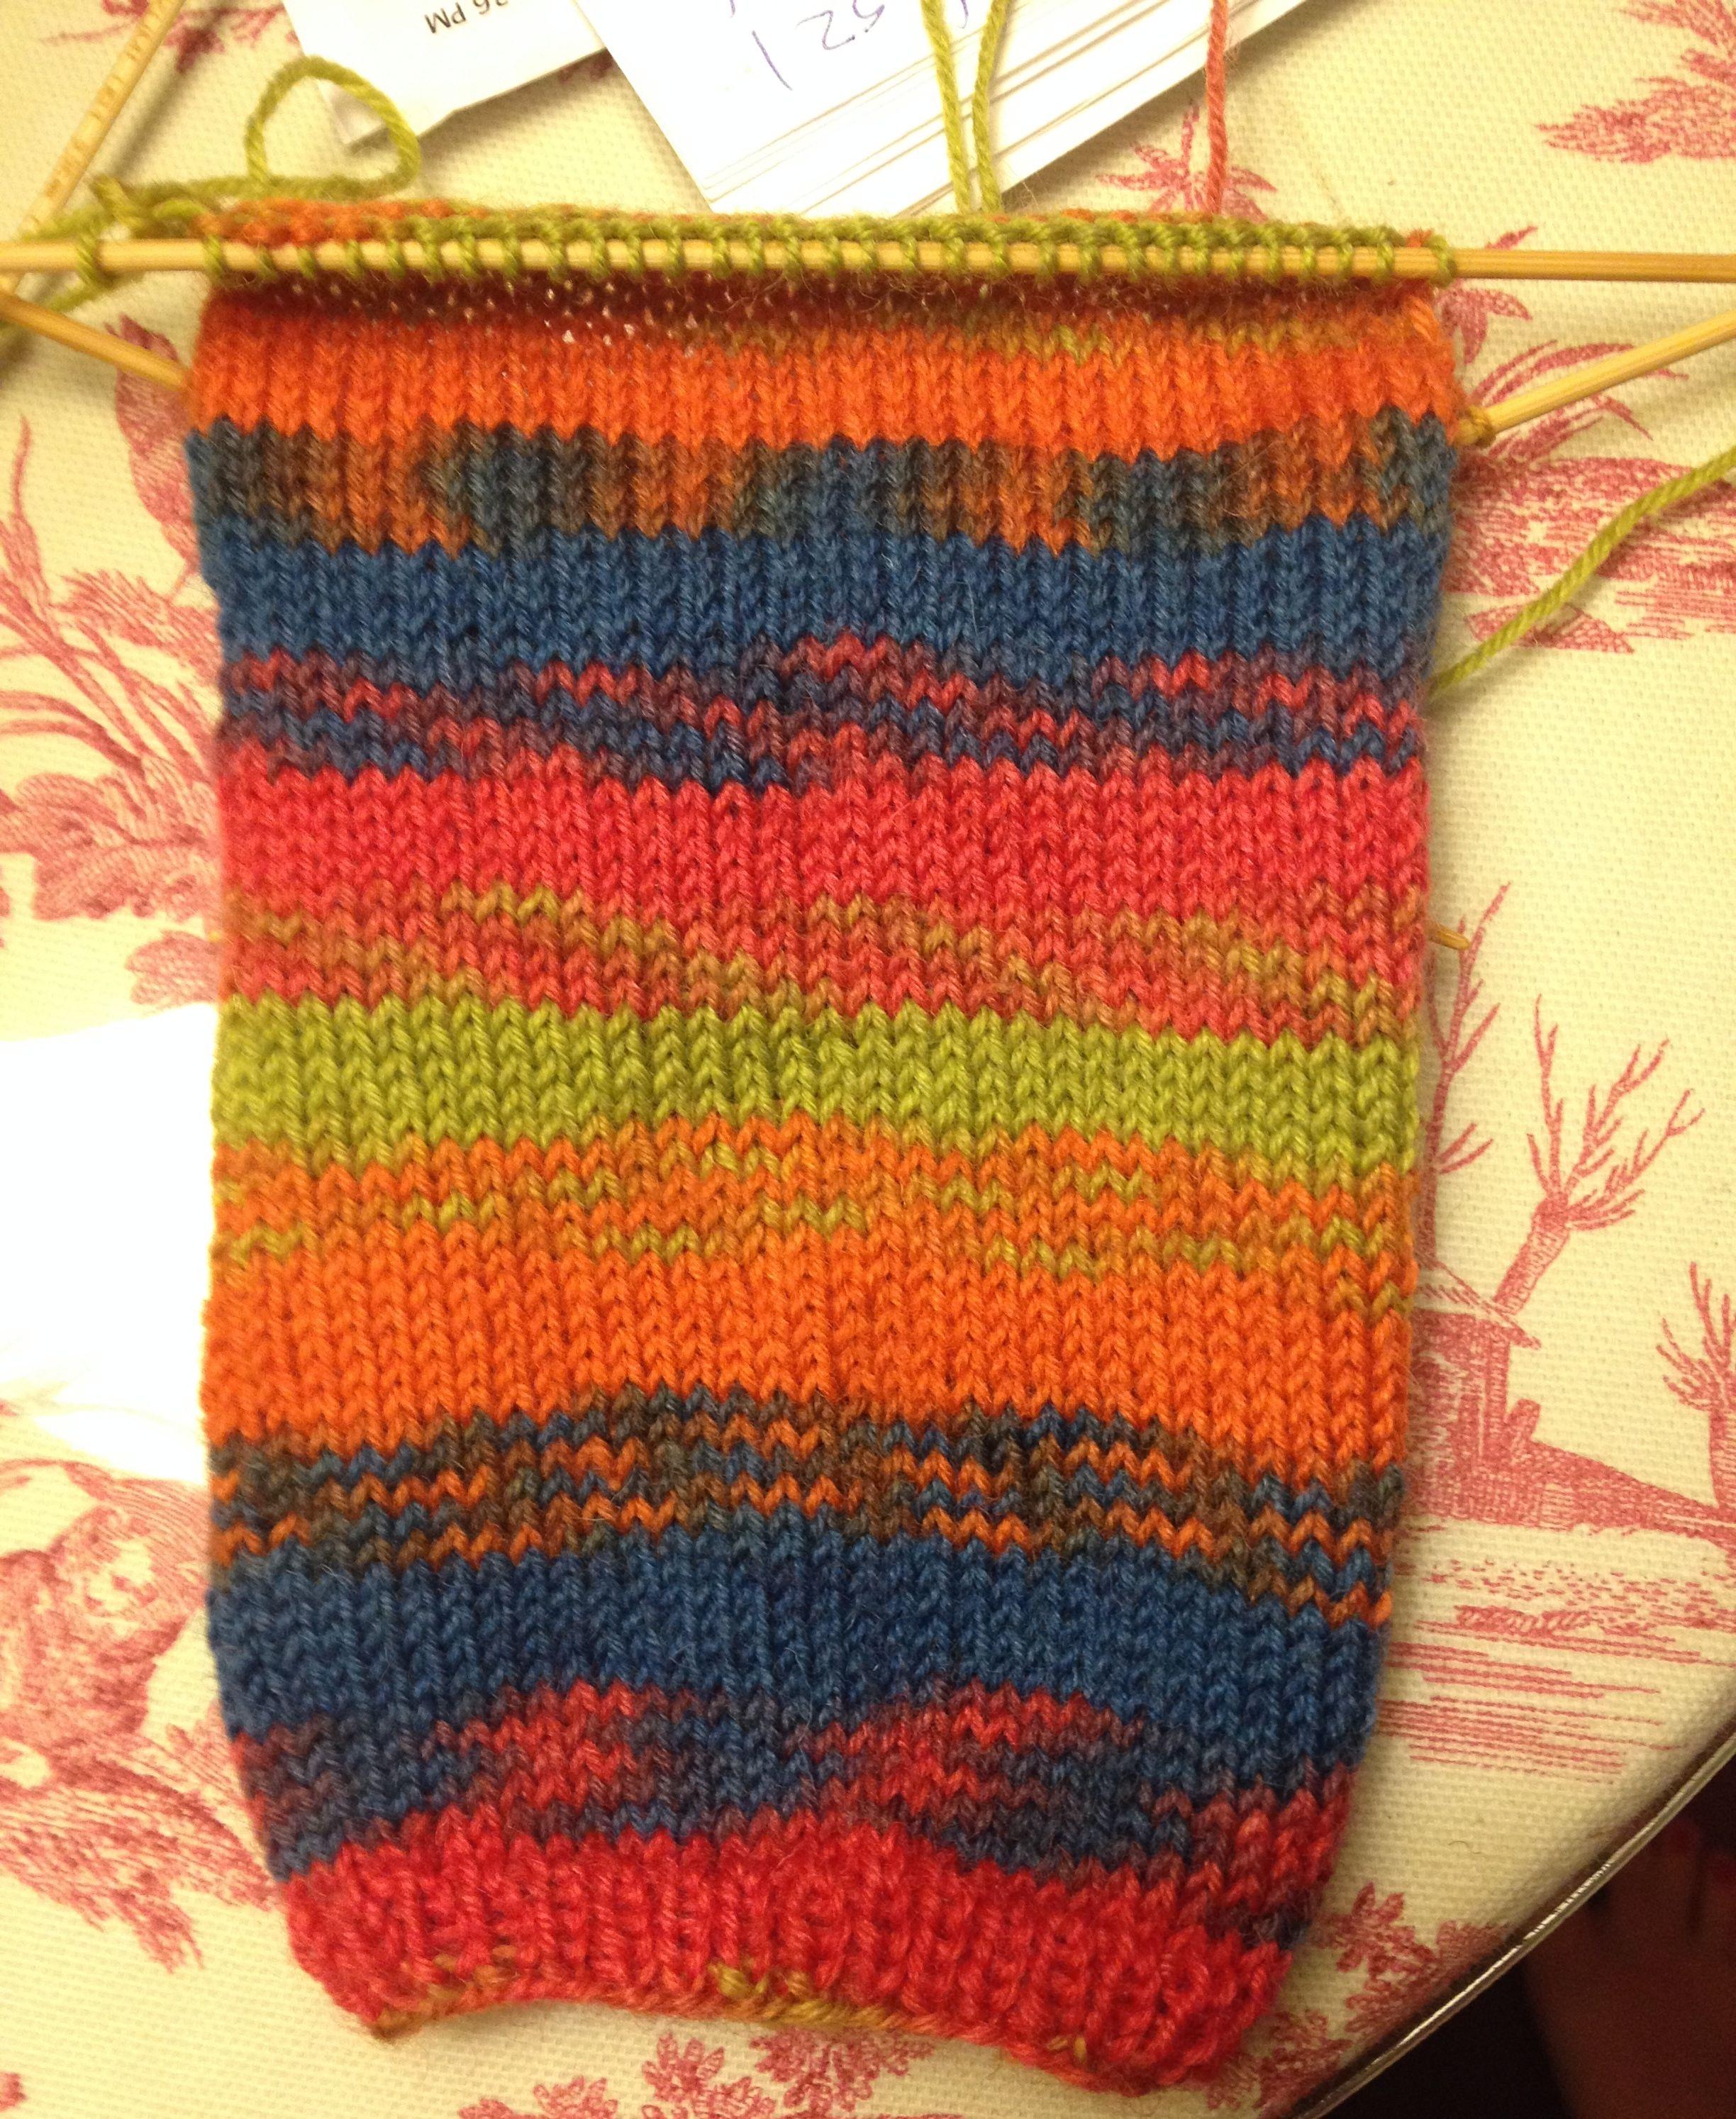 Knitting Patterns For Funky Socks : Socktober is Here! Knit and Crochet